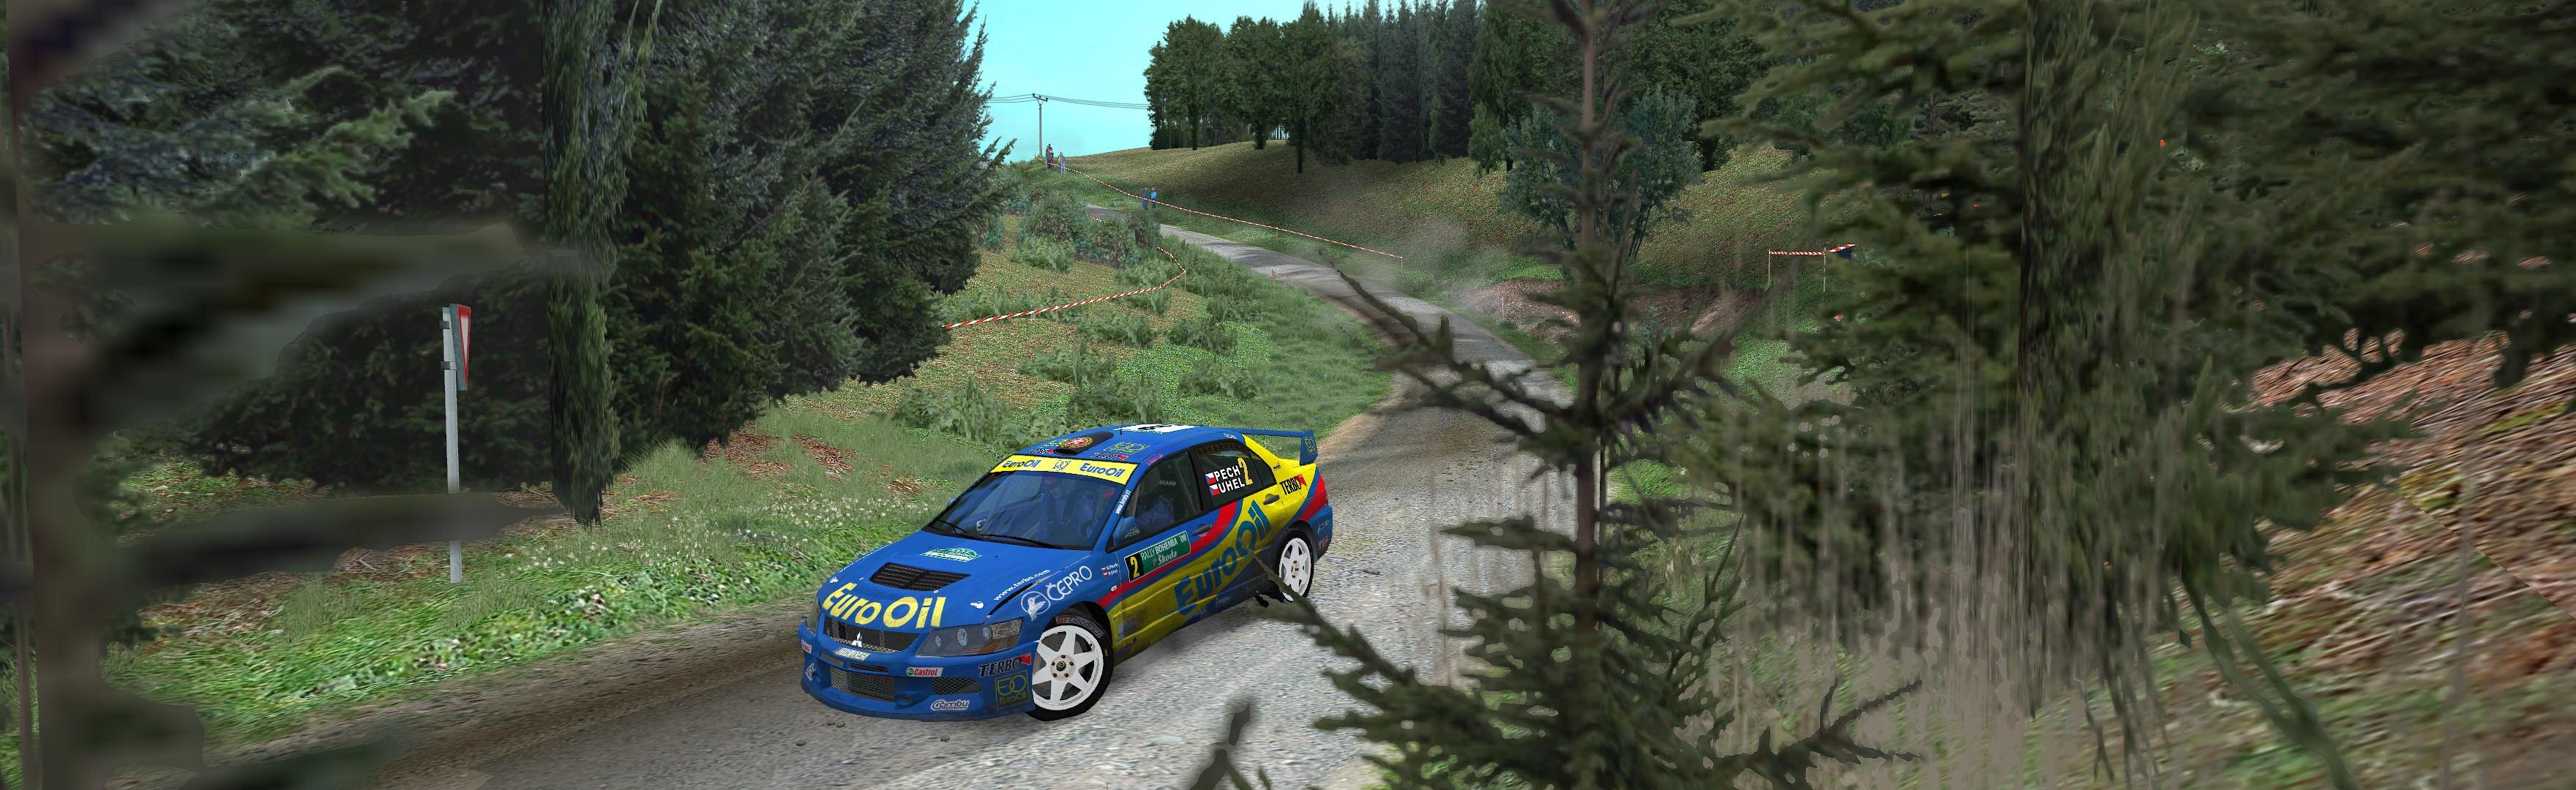 Richard Burns Rally 2004 RSRBR manual | WSGF